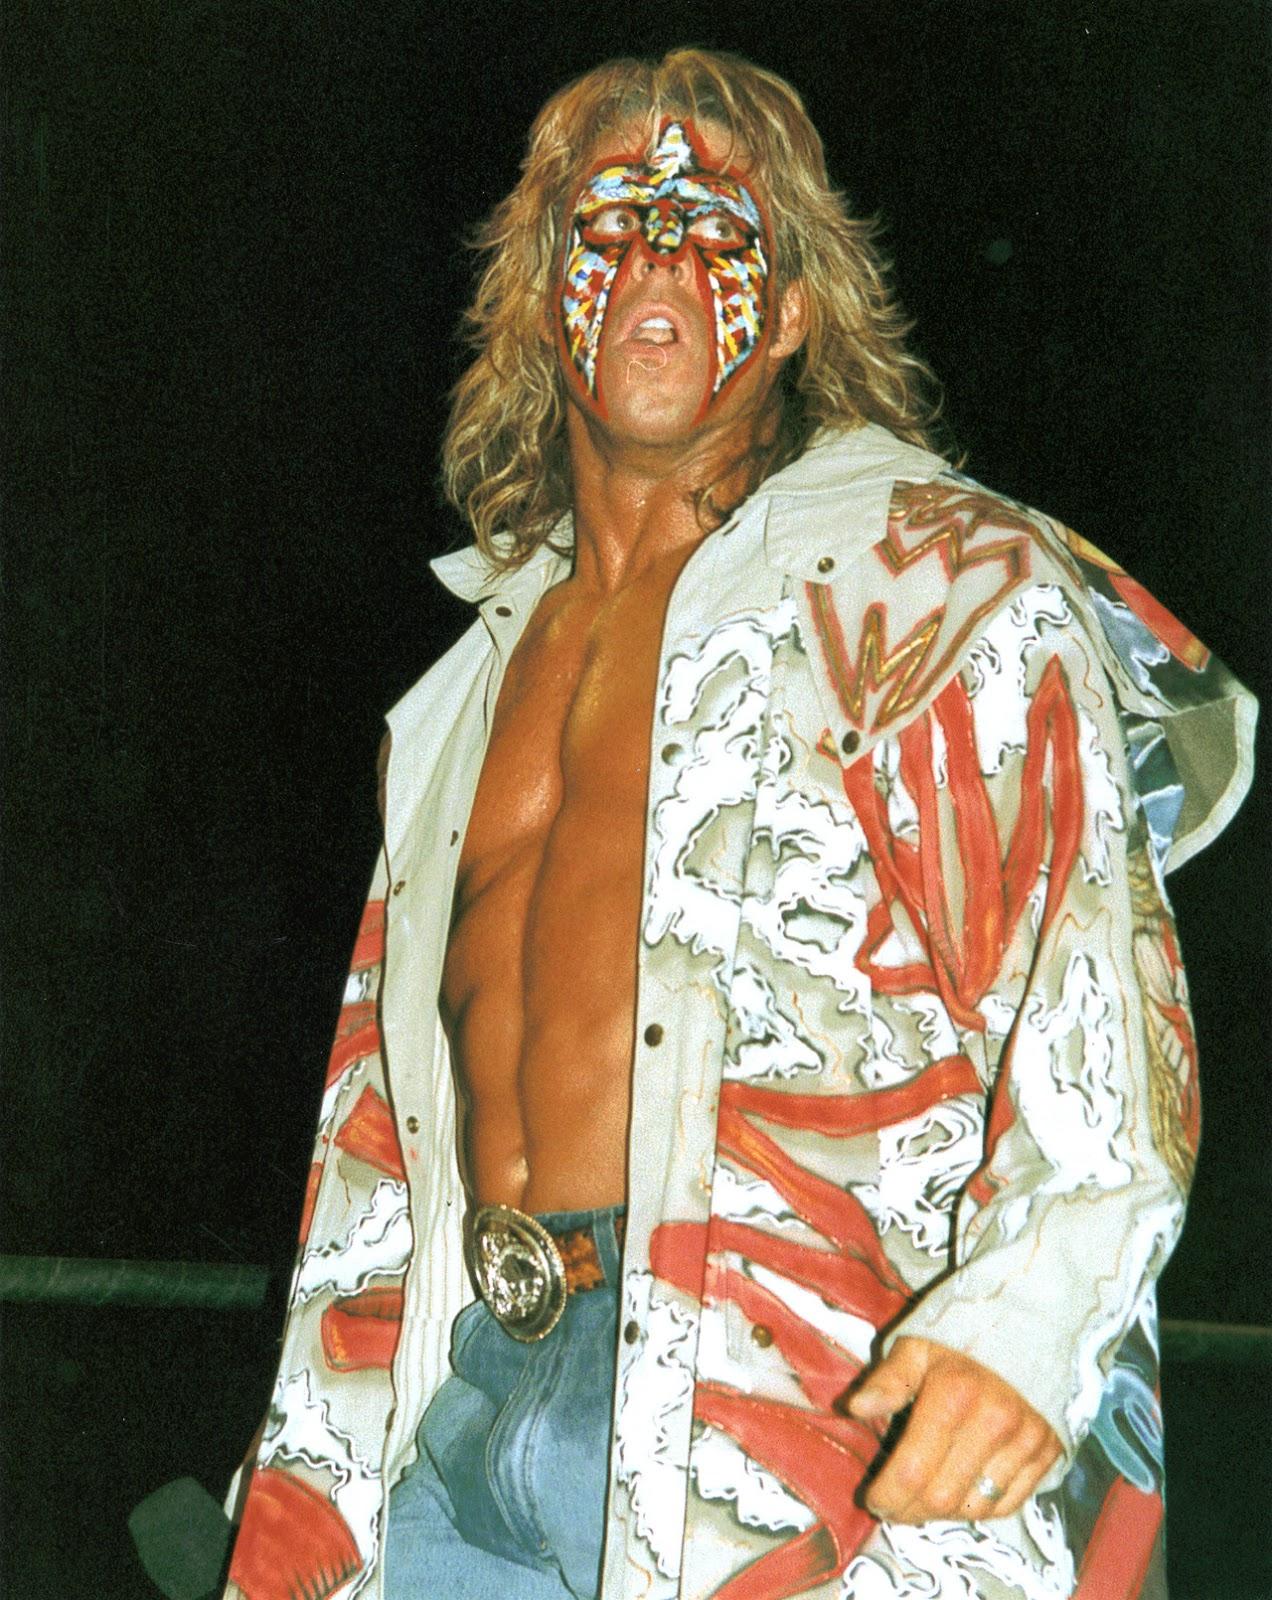 The Wrestling Insomniac: The Ultimate Warrior's WCW Run